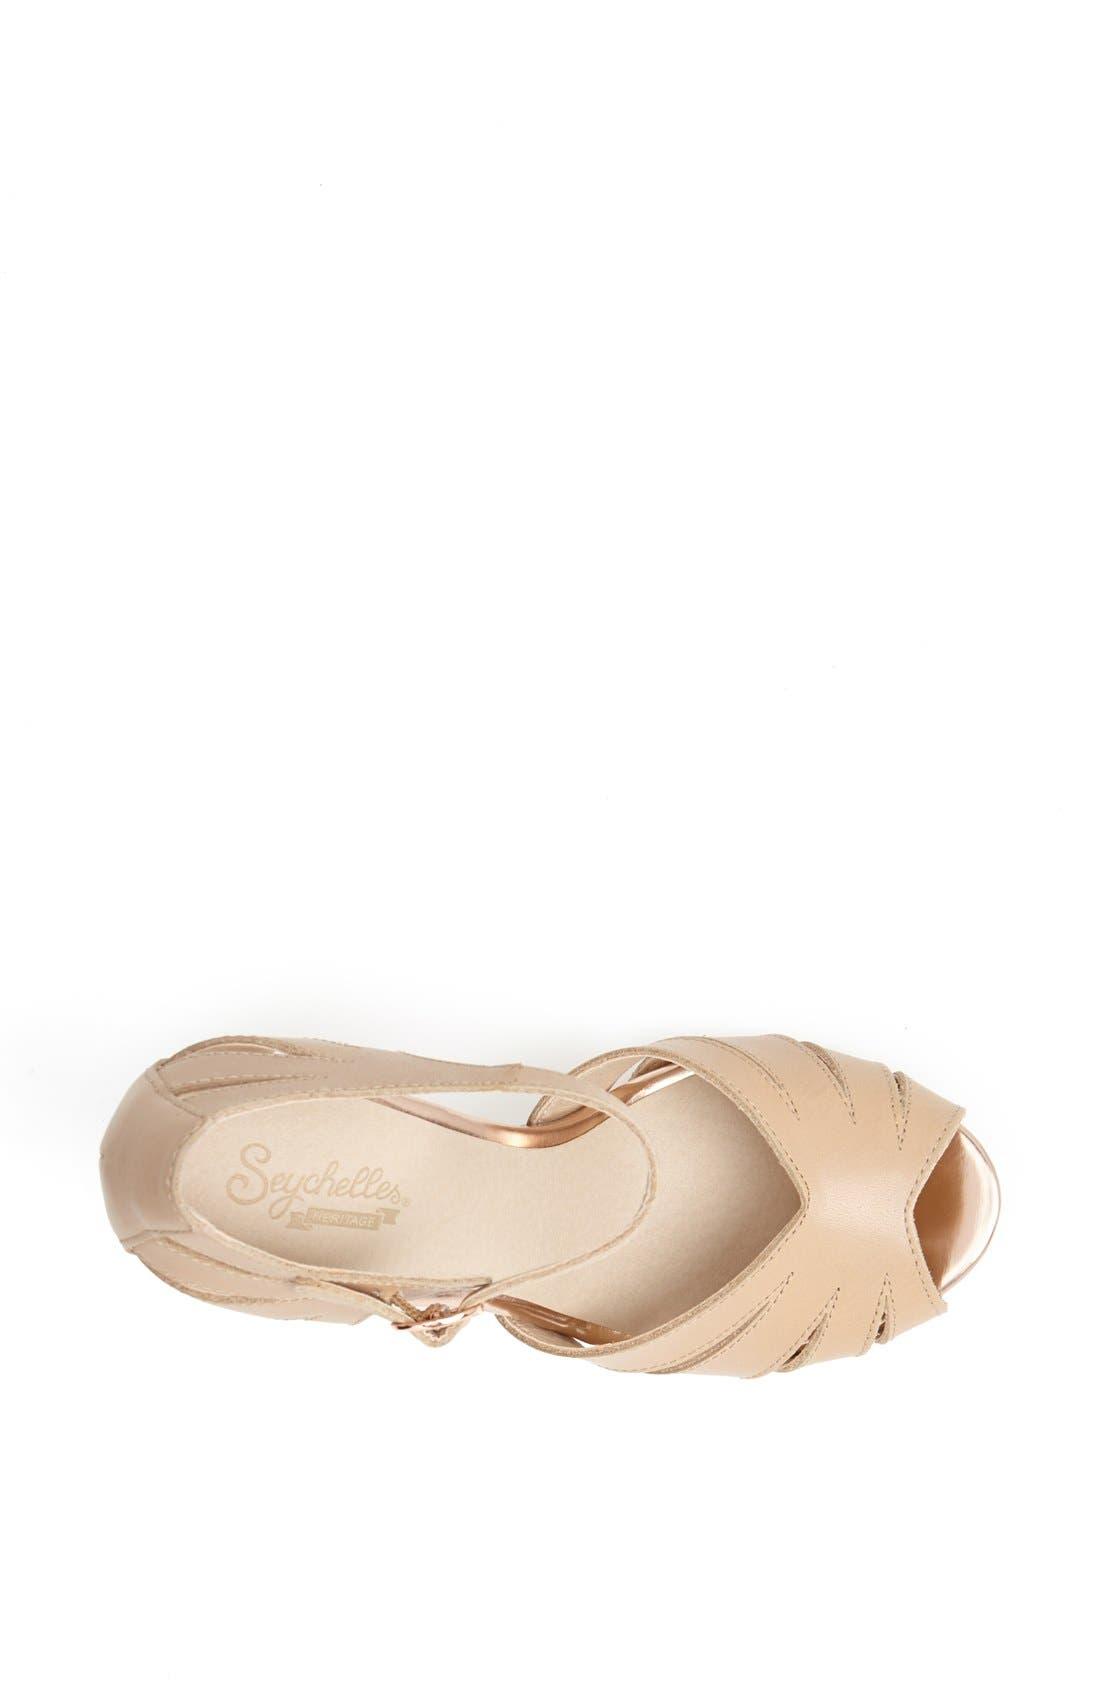 Alternate Image 3  - Seychelles 'On the Floor' Cutout Quarter Strap Sandal